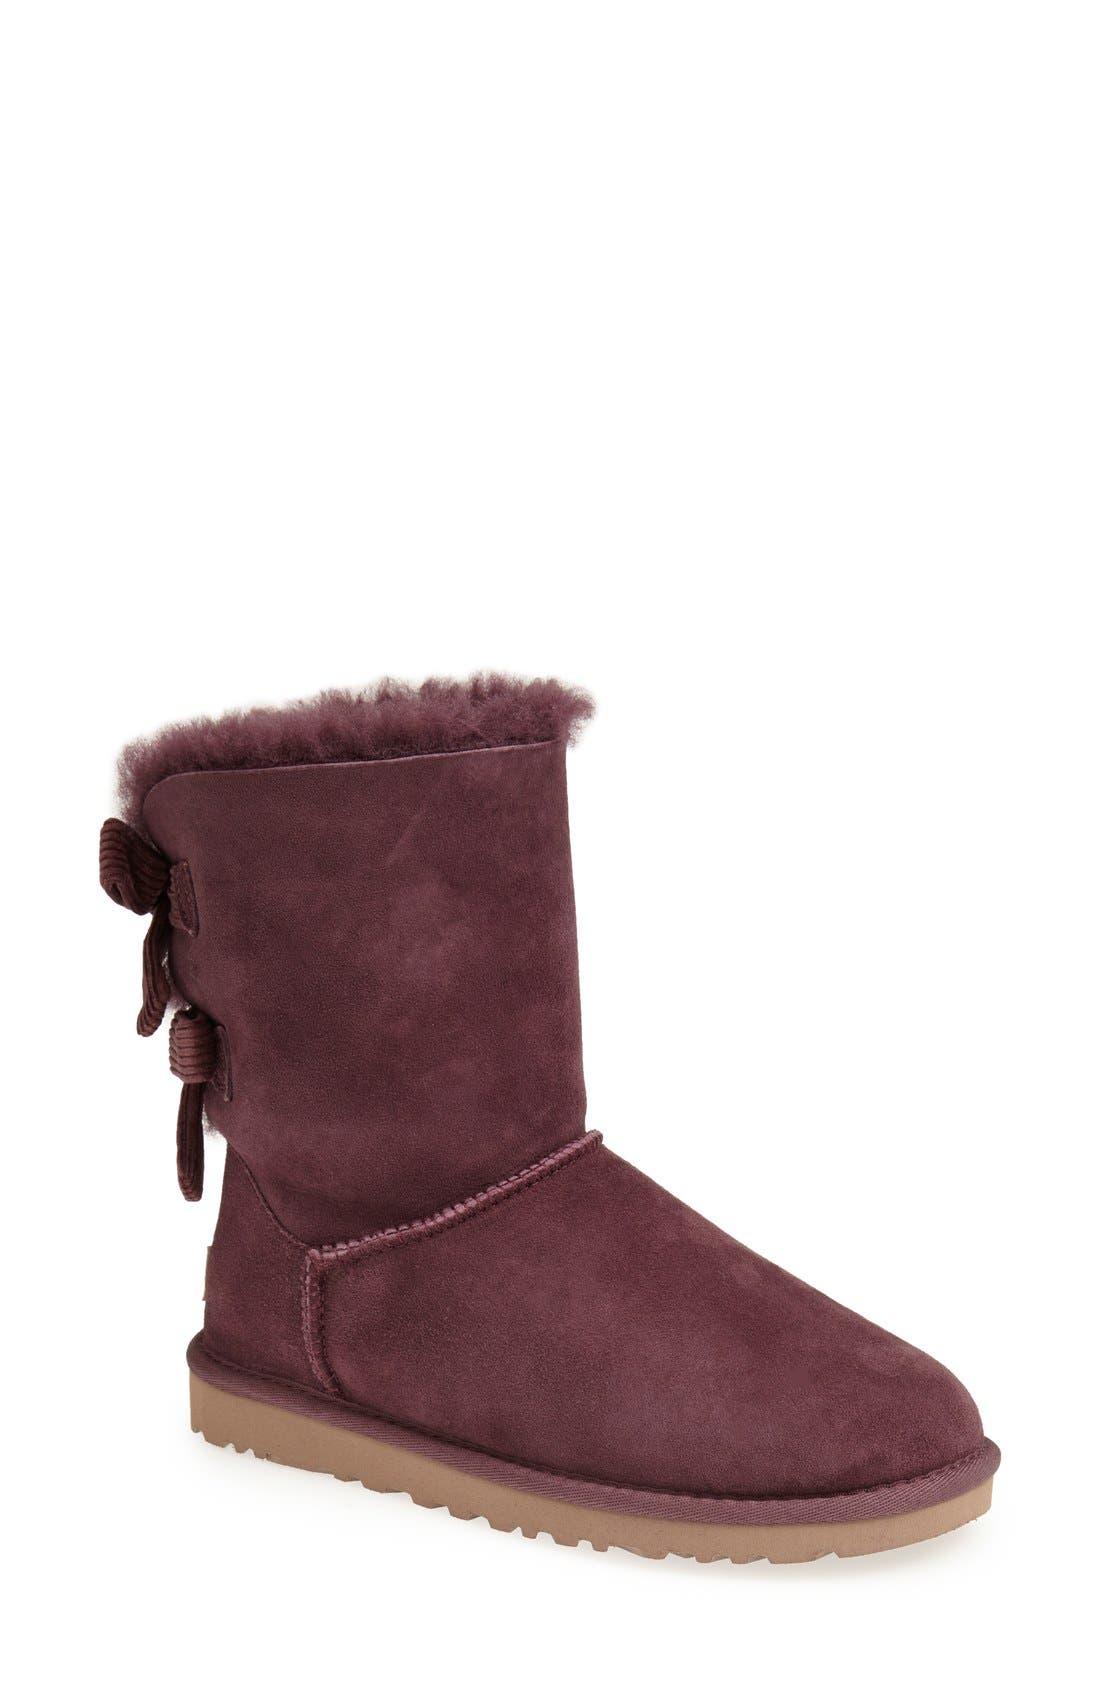 Main Image - UGG® Australia 'Bailey Bow Corduroy' Boot (Women)